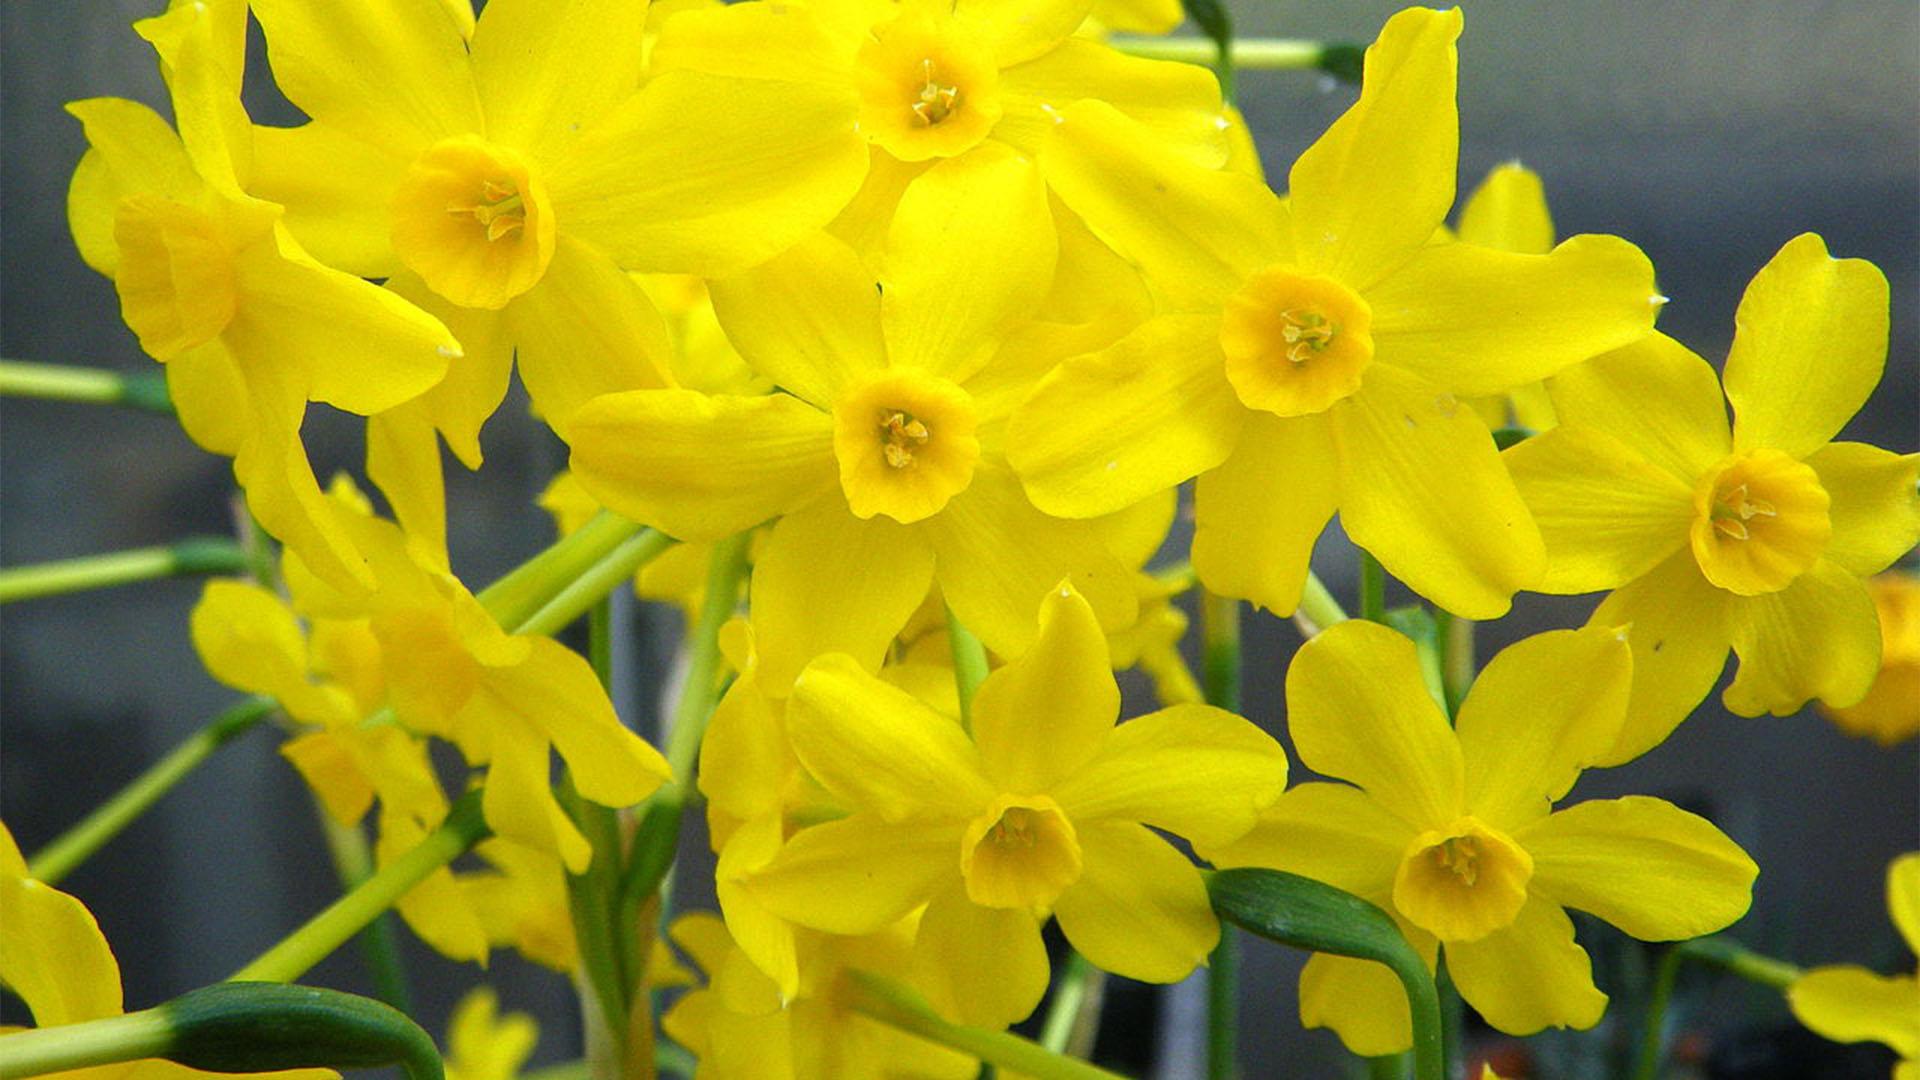 El junquillo, die Jonquille bzw. Narcissus jonquilla.